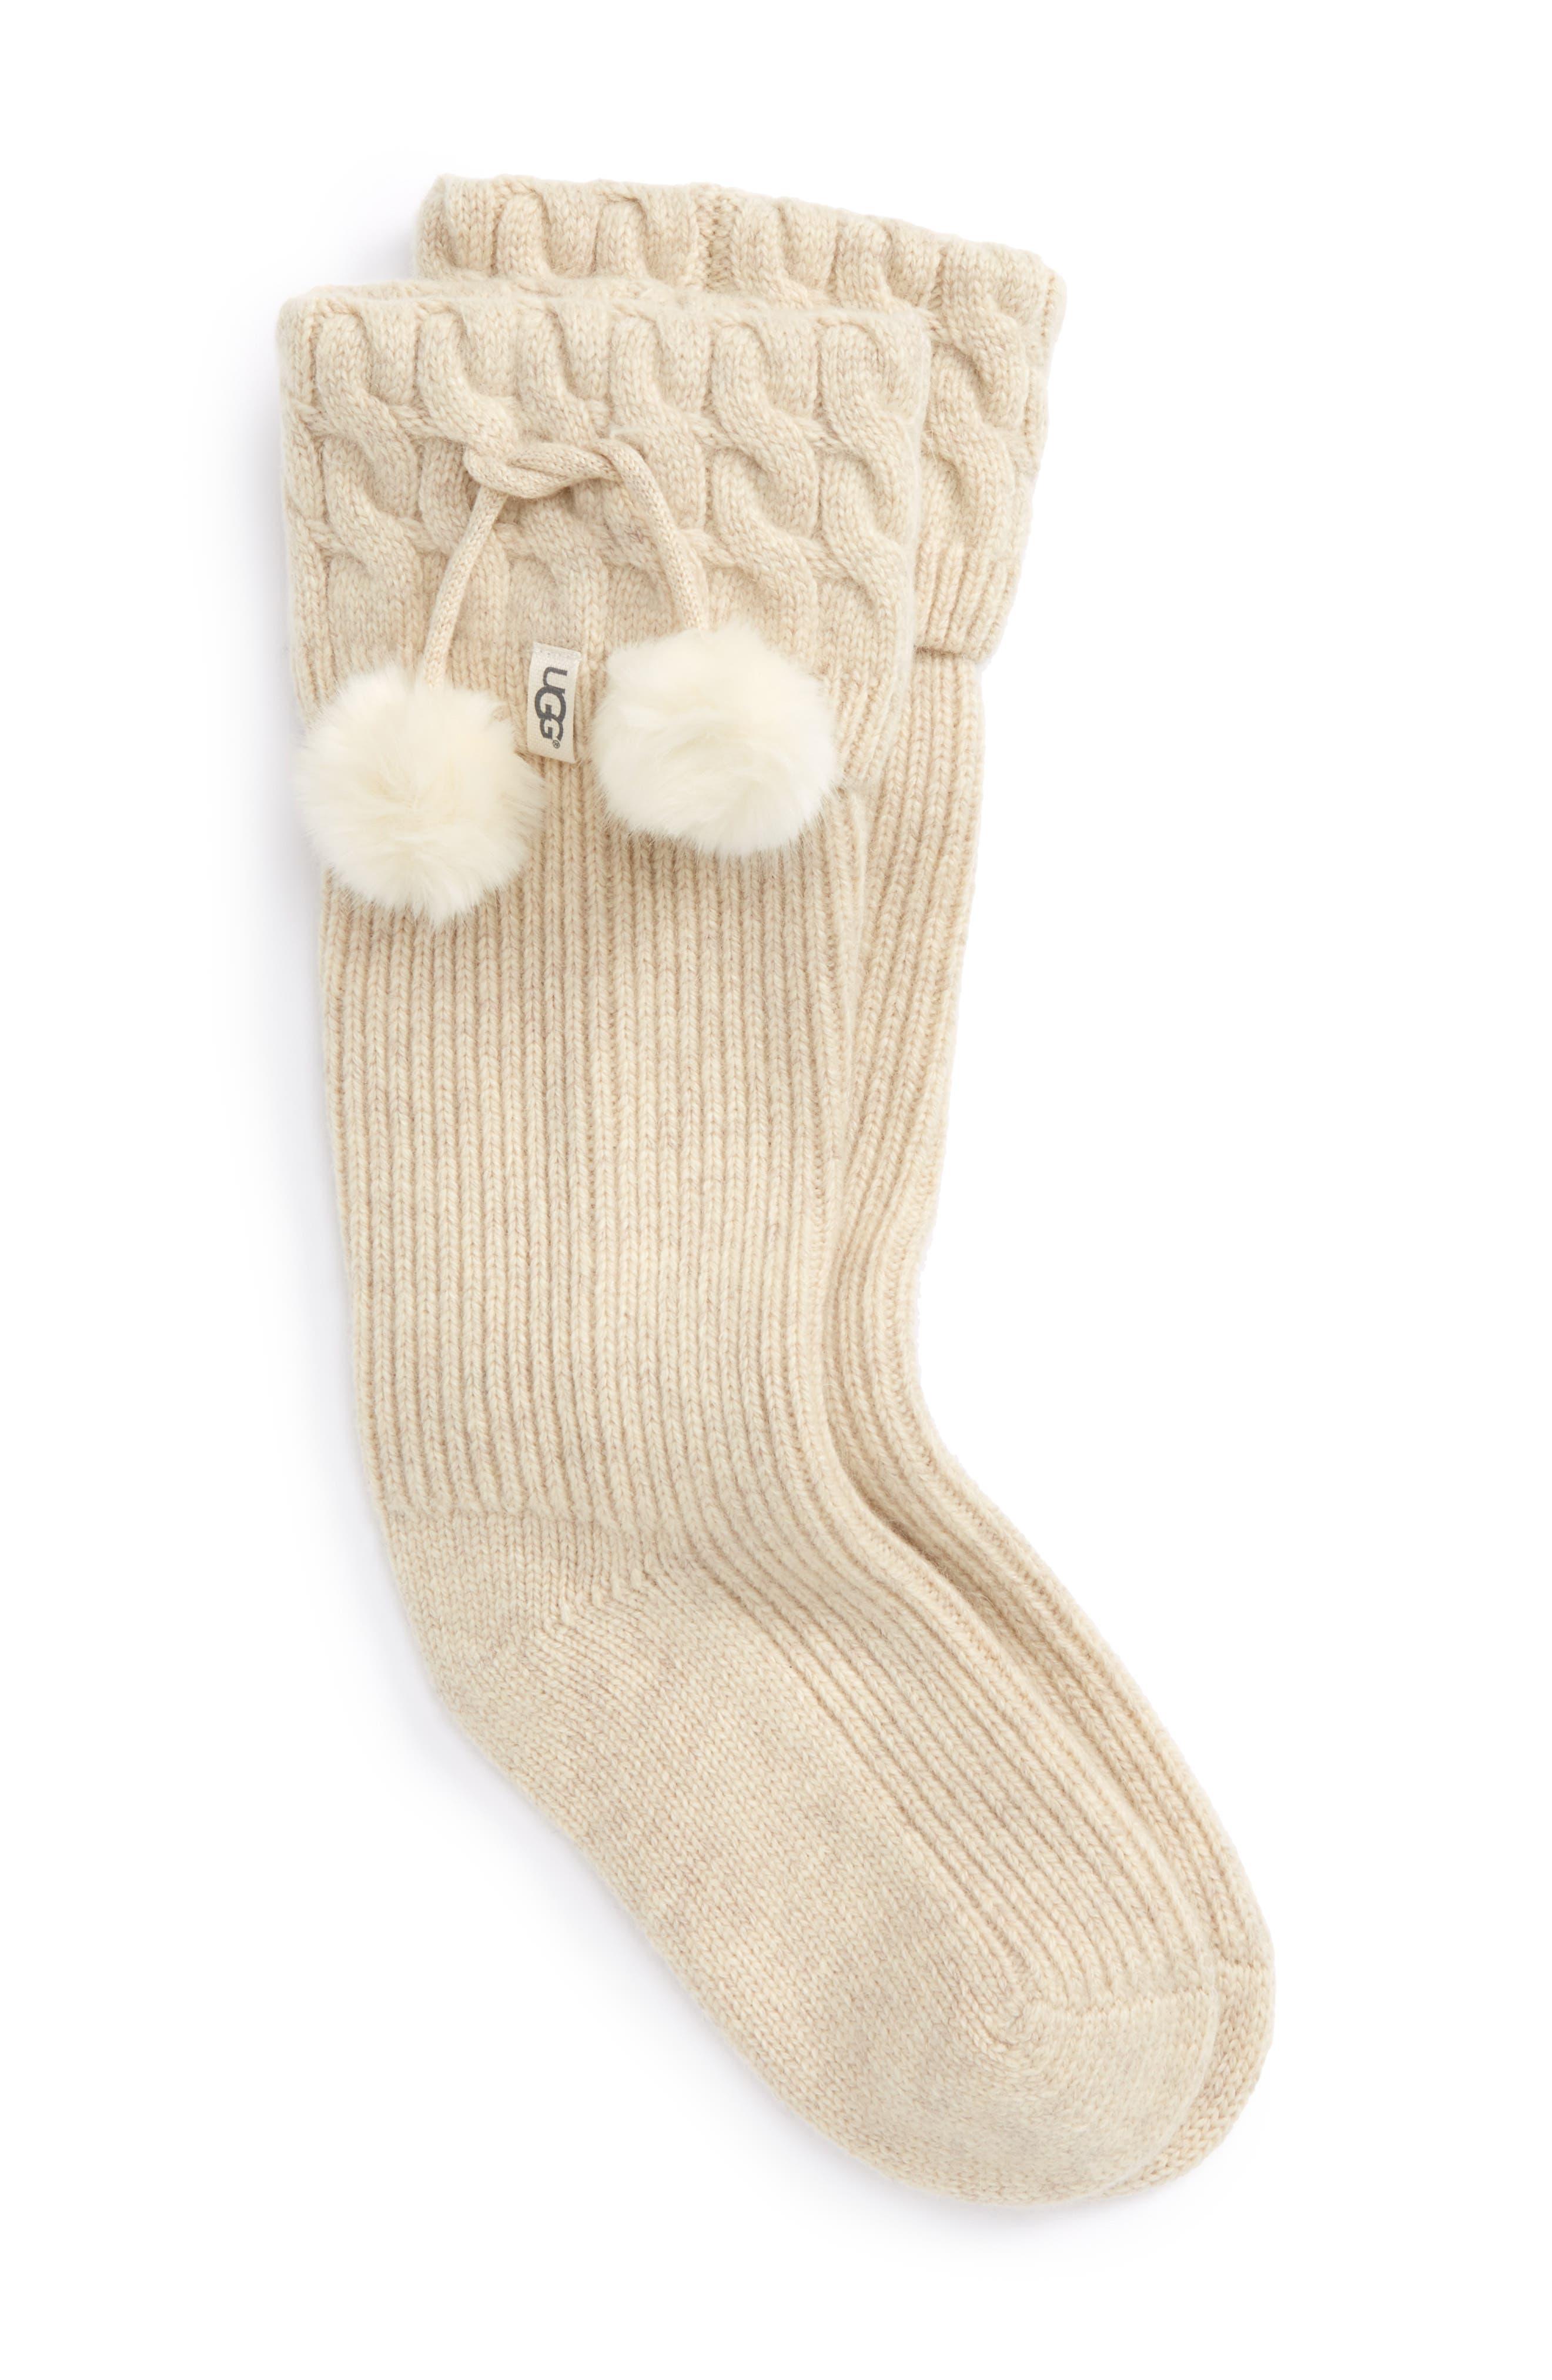 Main Image - UGG UGGpure™ Pompom Tall Rain Boot Sock (Women)